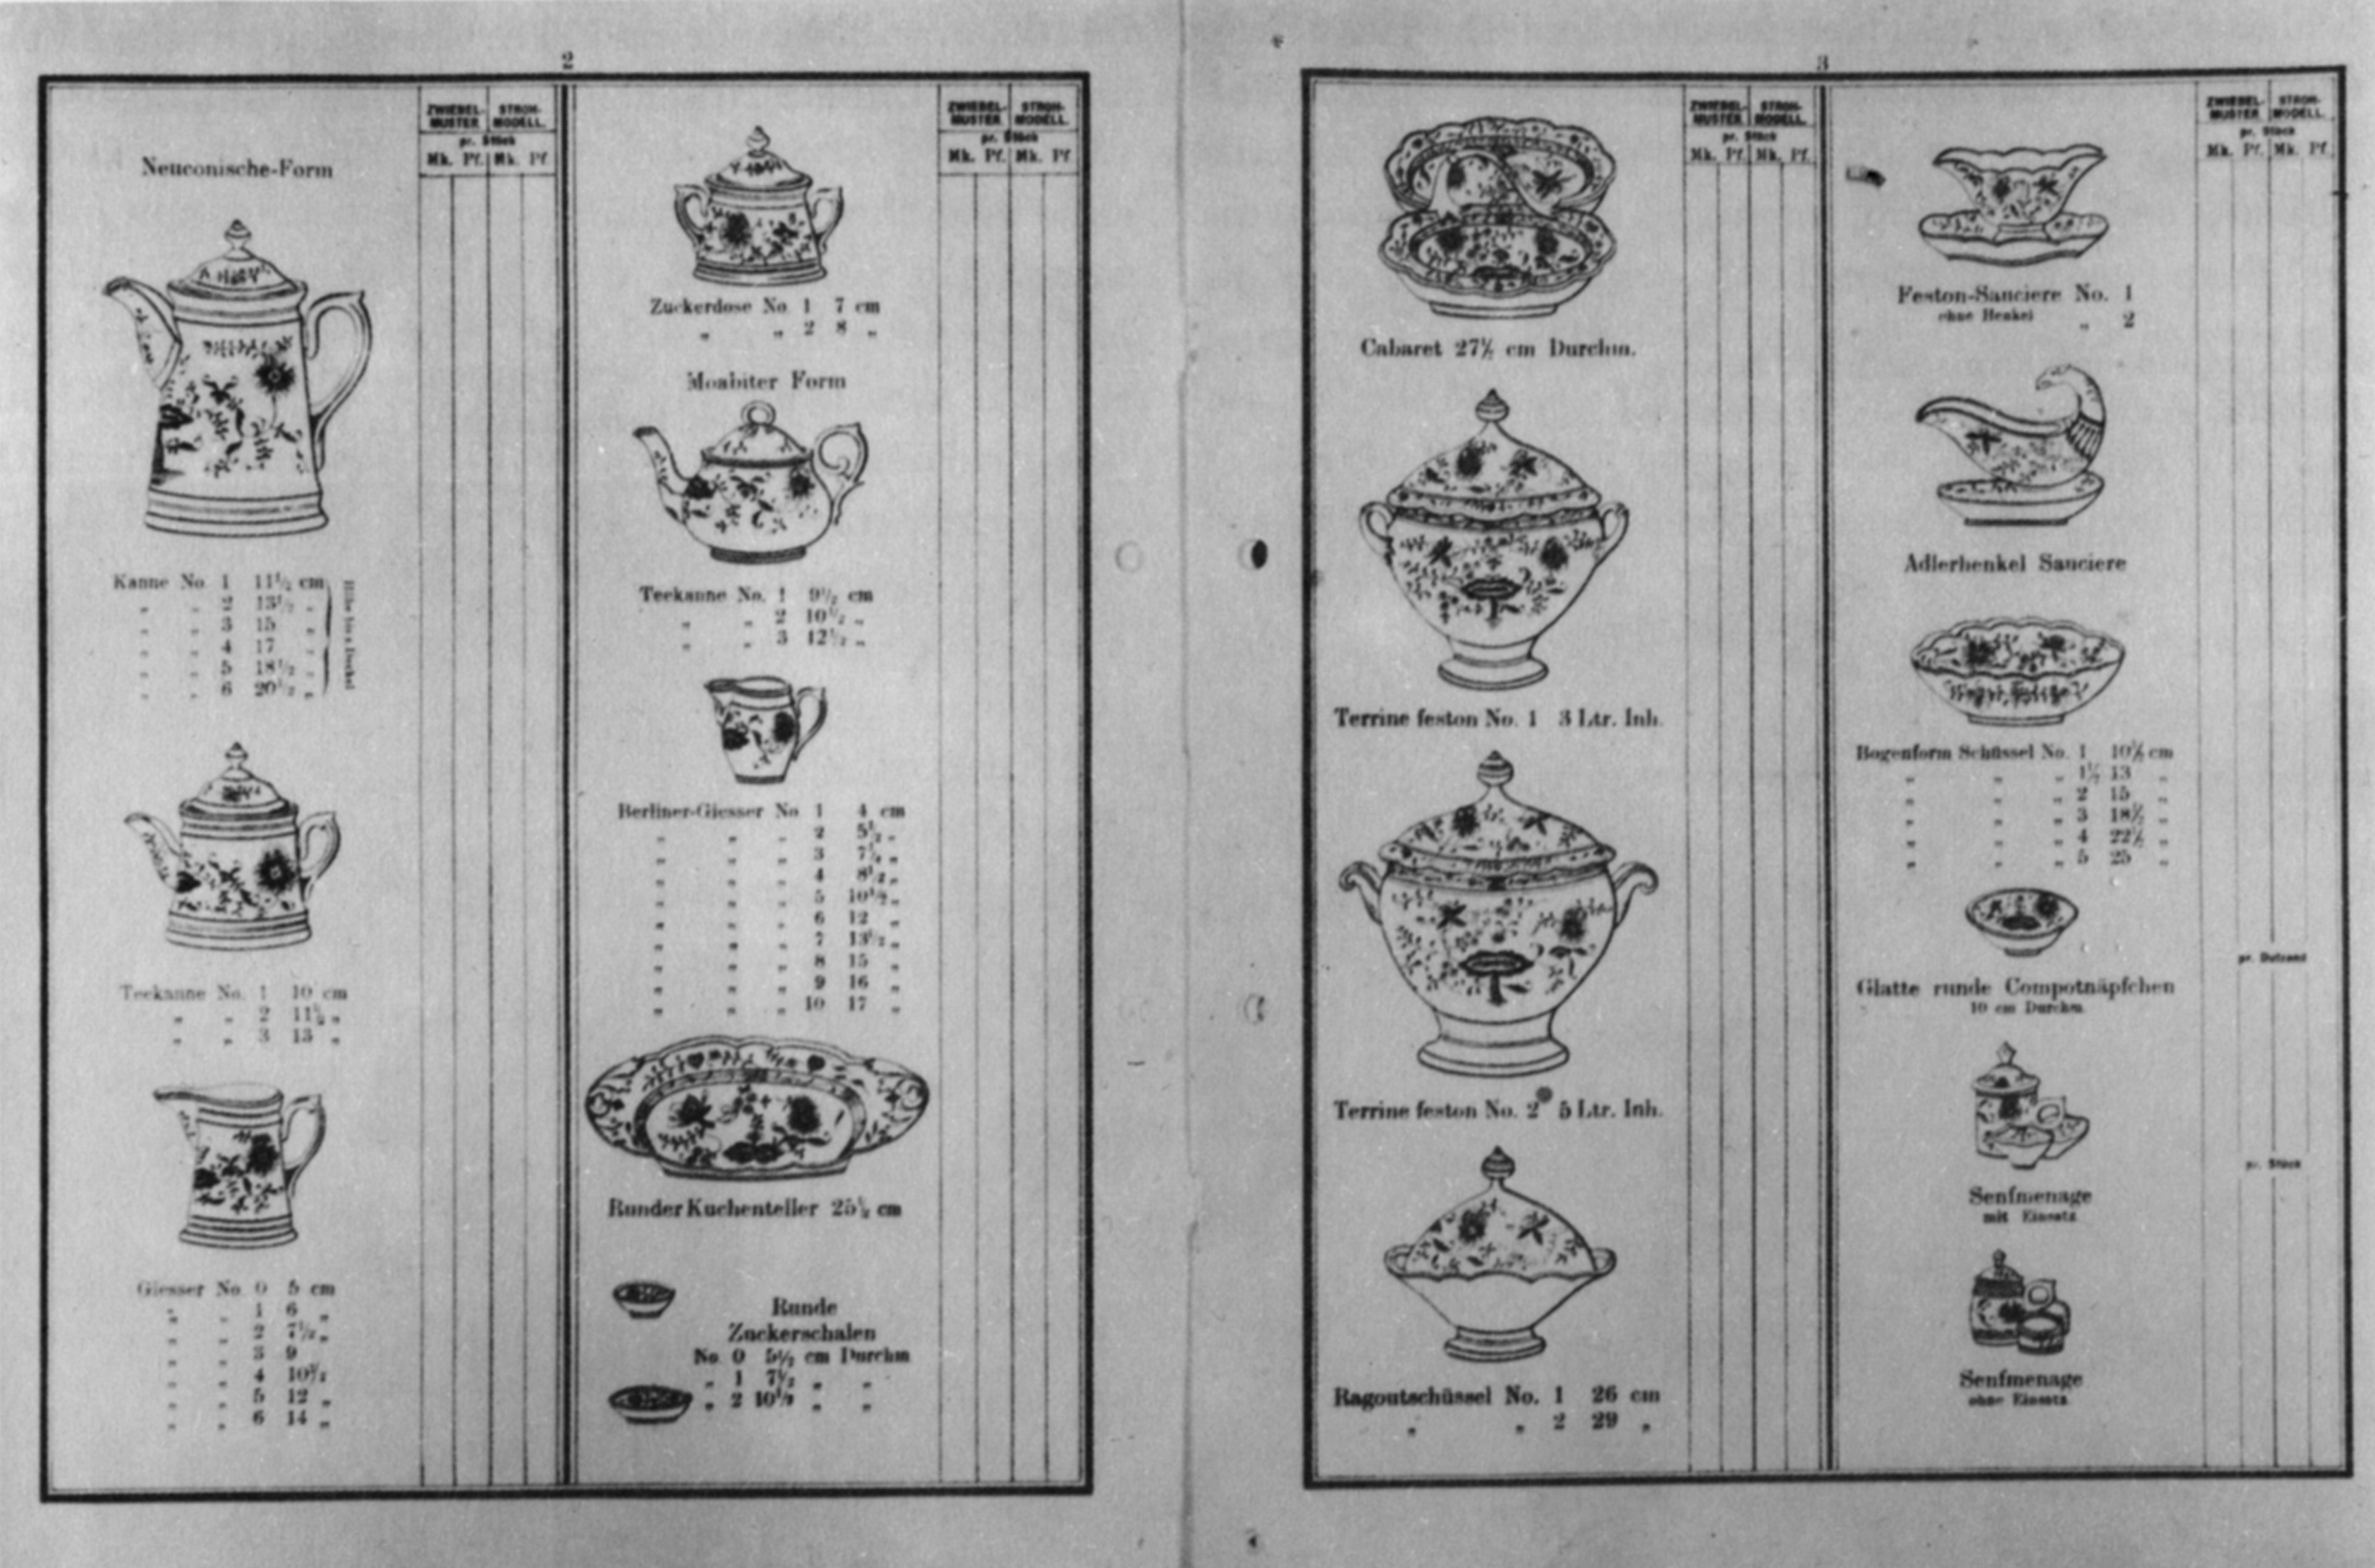 scherf helmut und karpinski j rgen 1980 th ringer porzellan unter besonderer. Black Bedroom Furniture Sets. Home Design Ideas